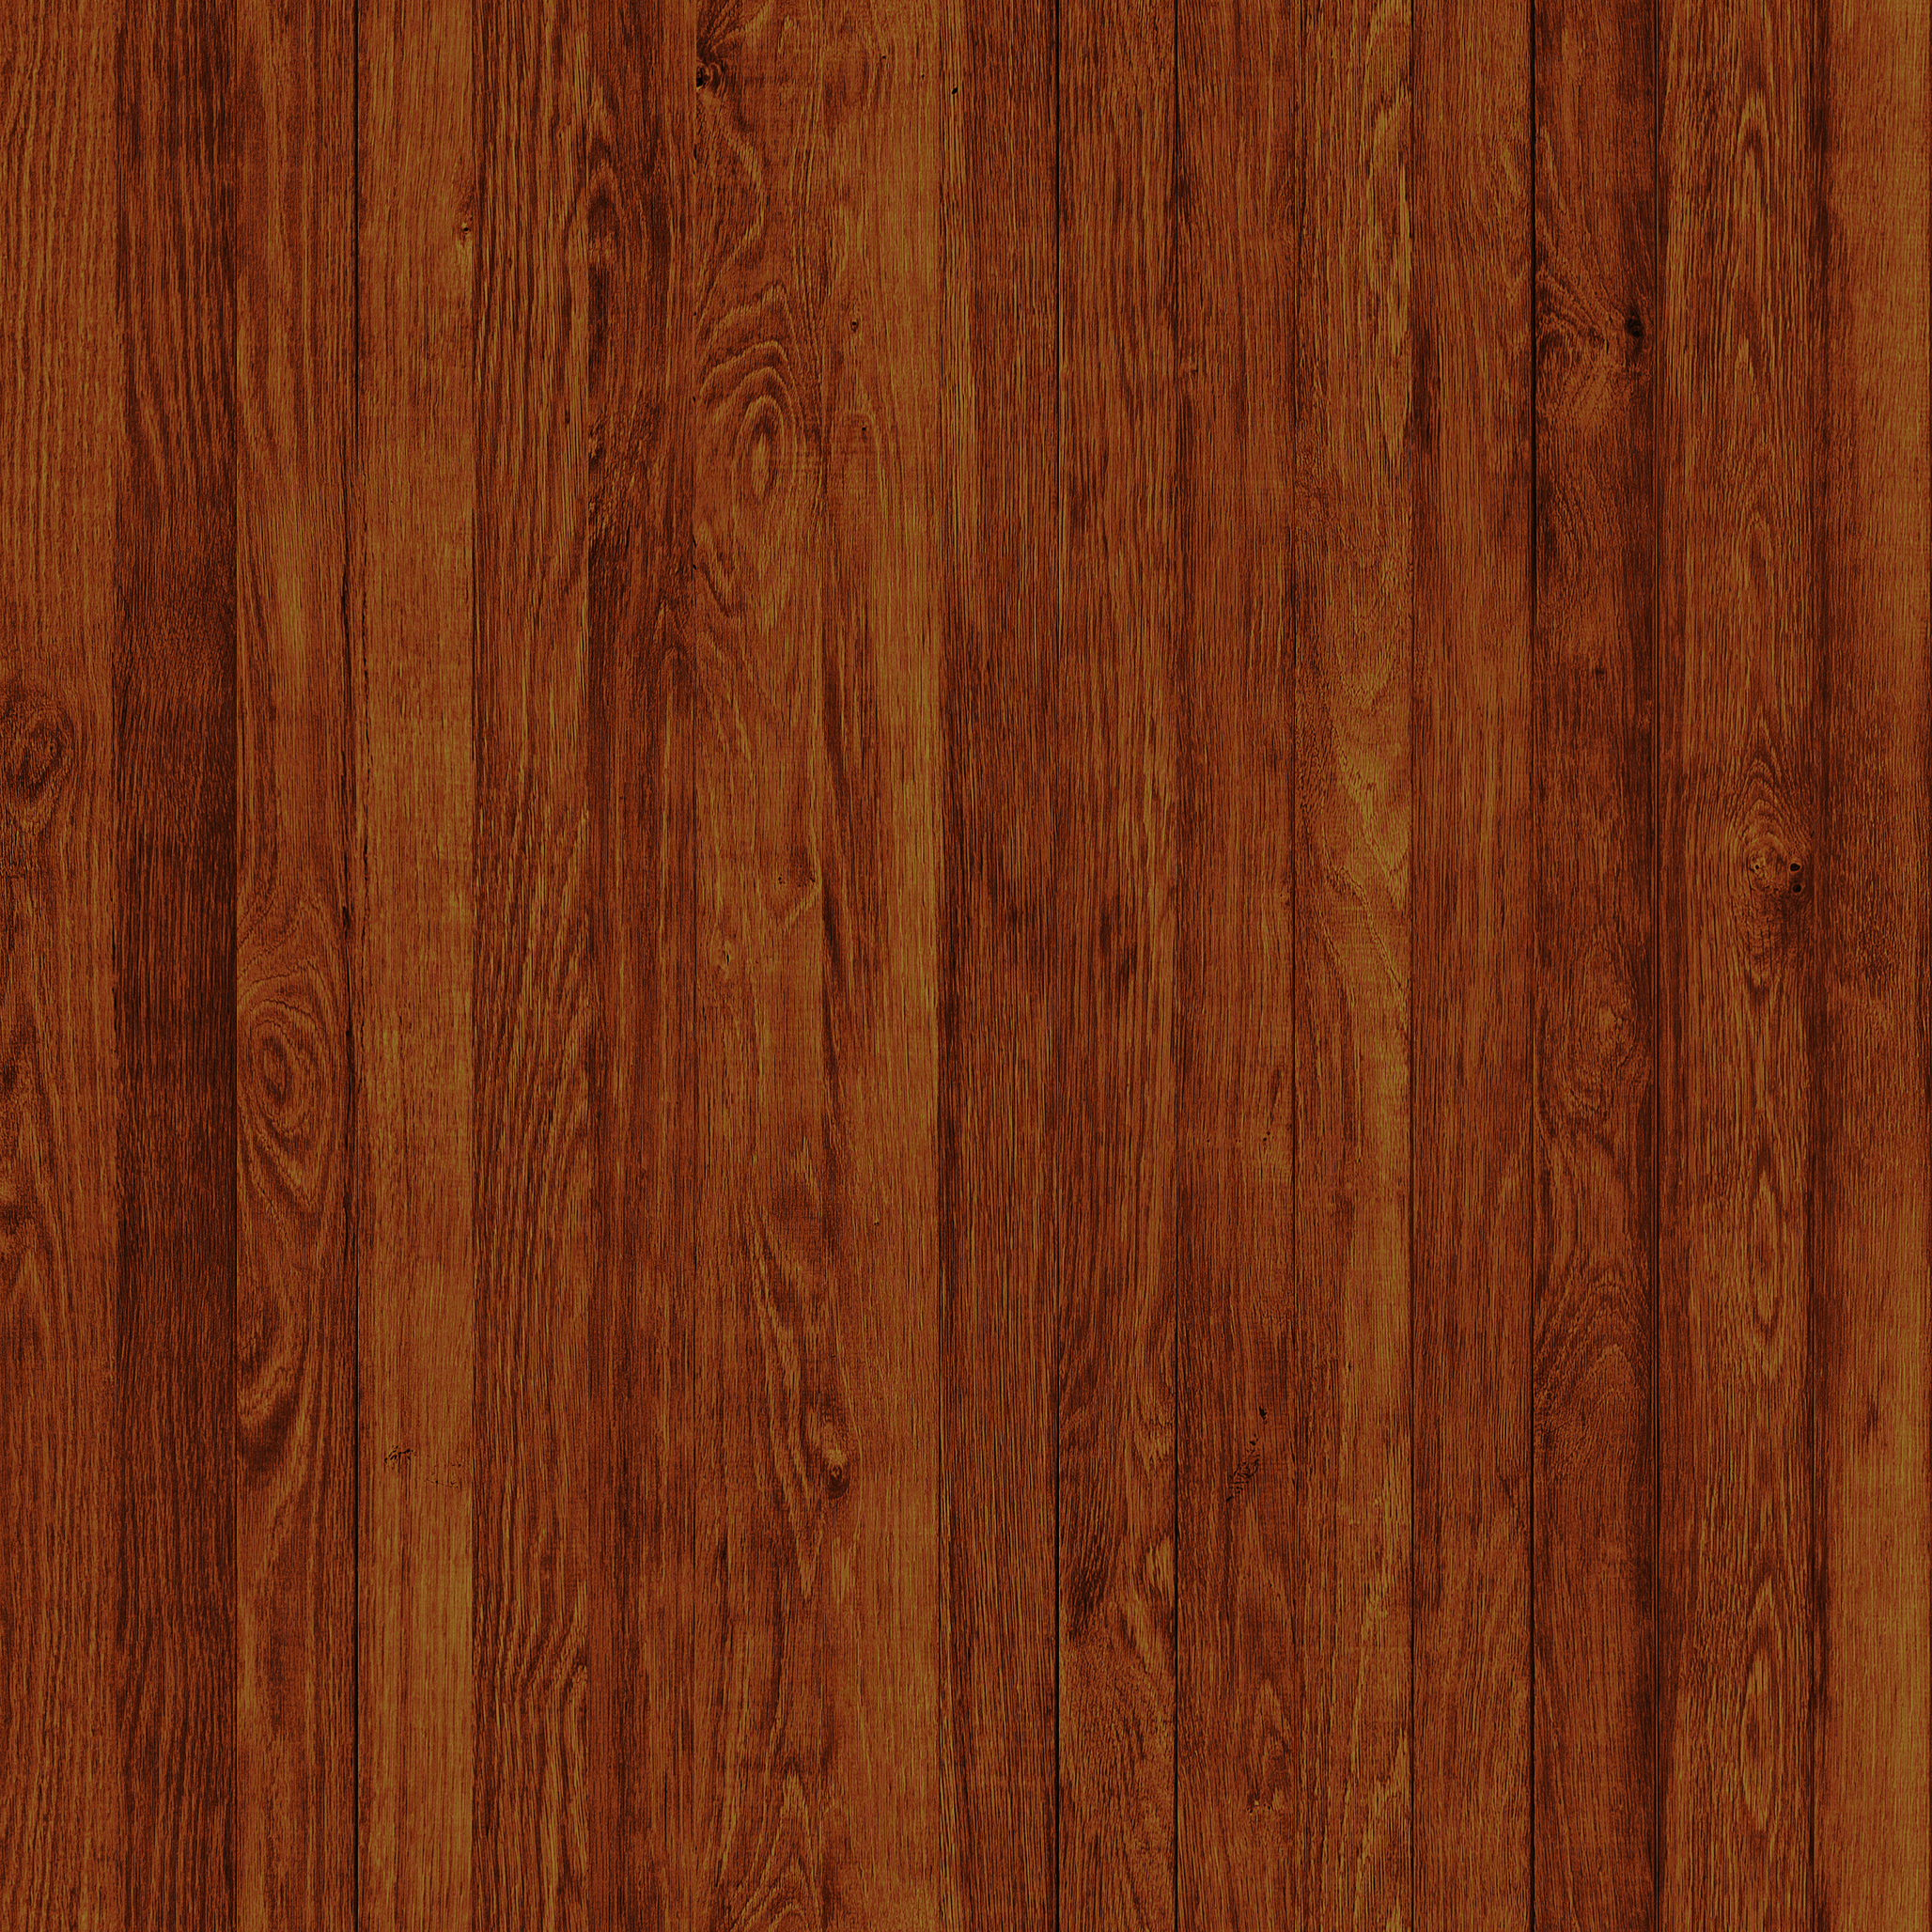 [48+] Cherry Wood Wallpaper on WallpaperSafari